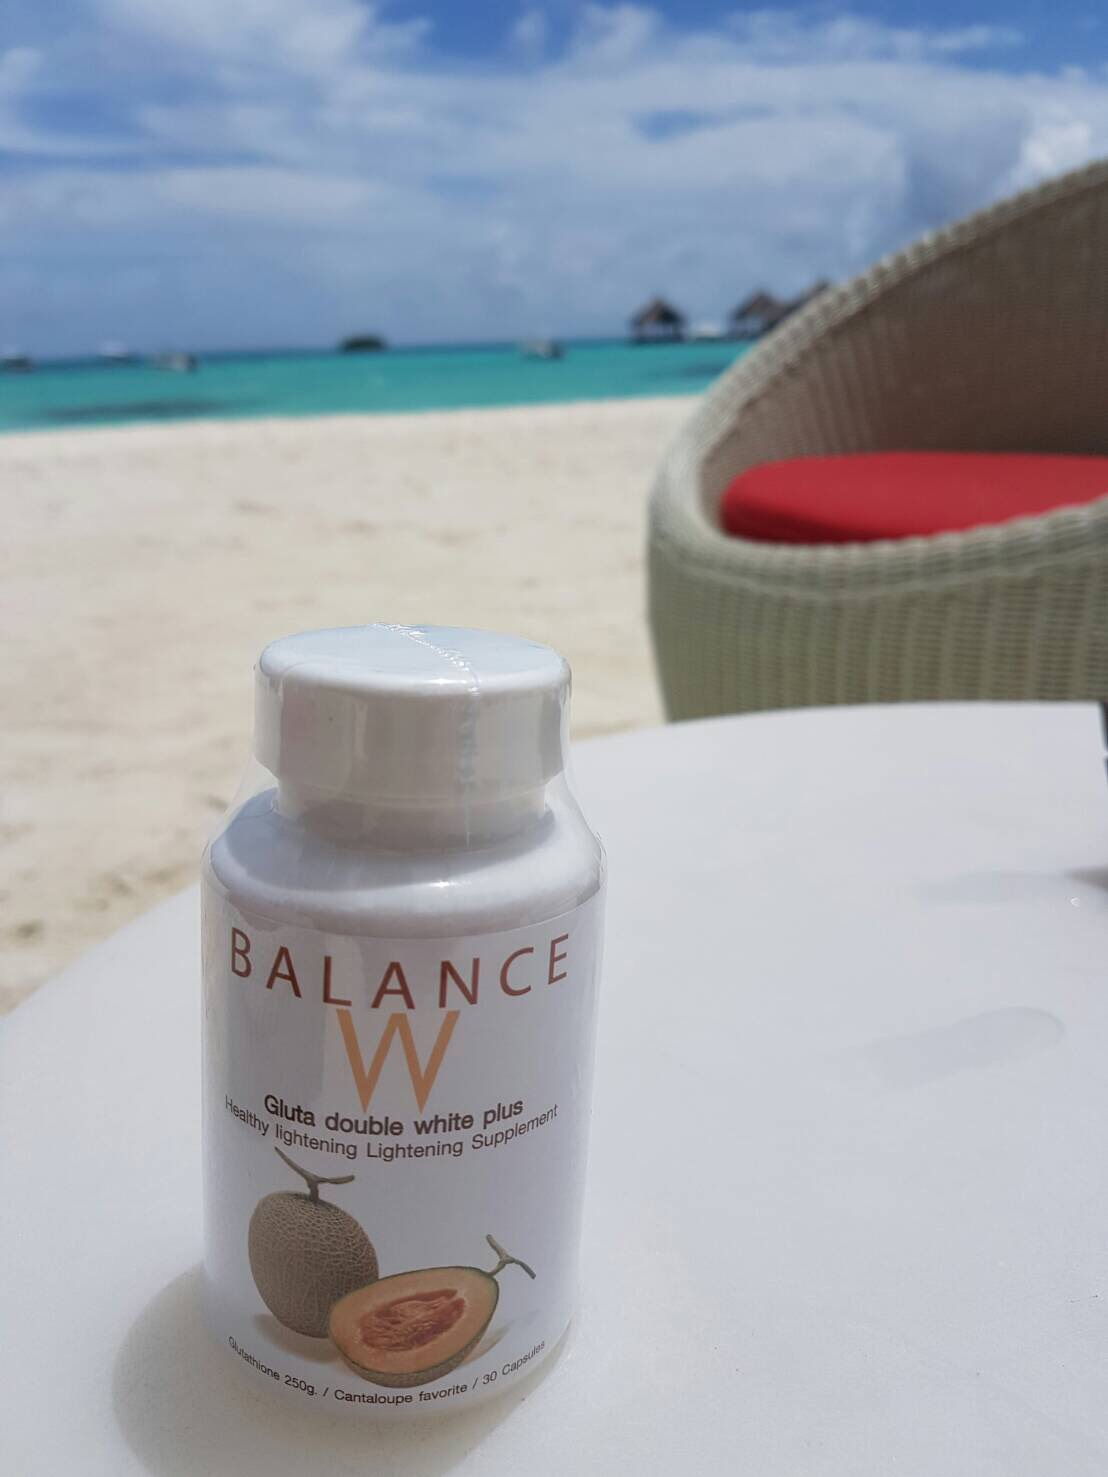 BALANCE W ( บาล๊าน ไวท์ )